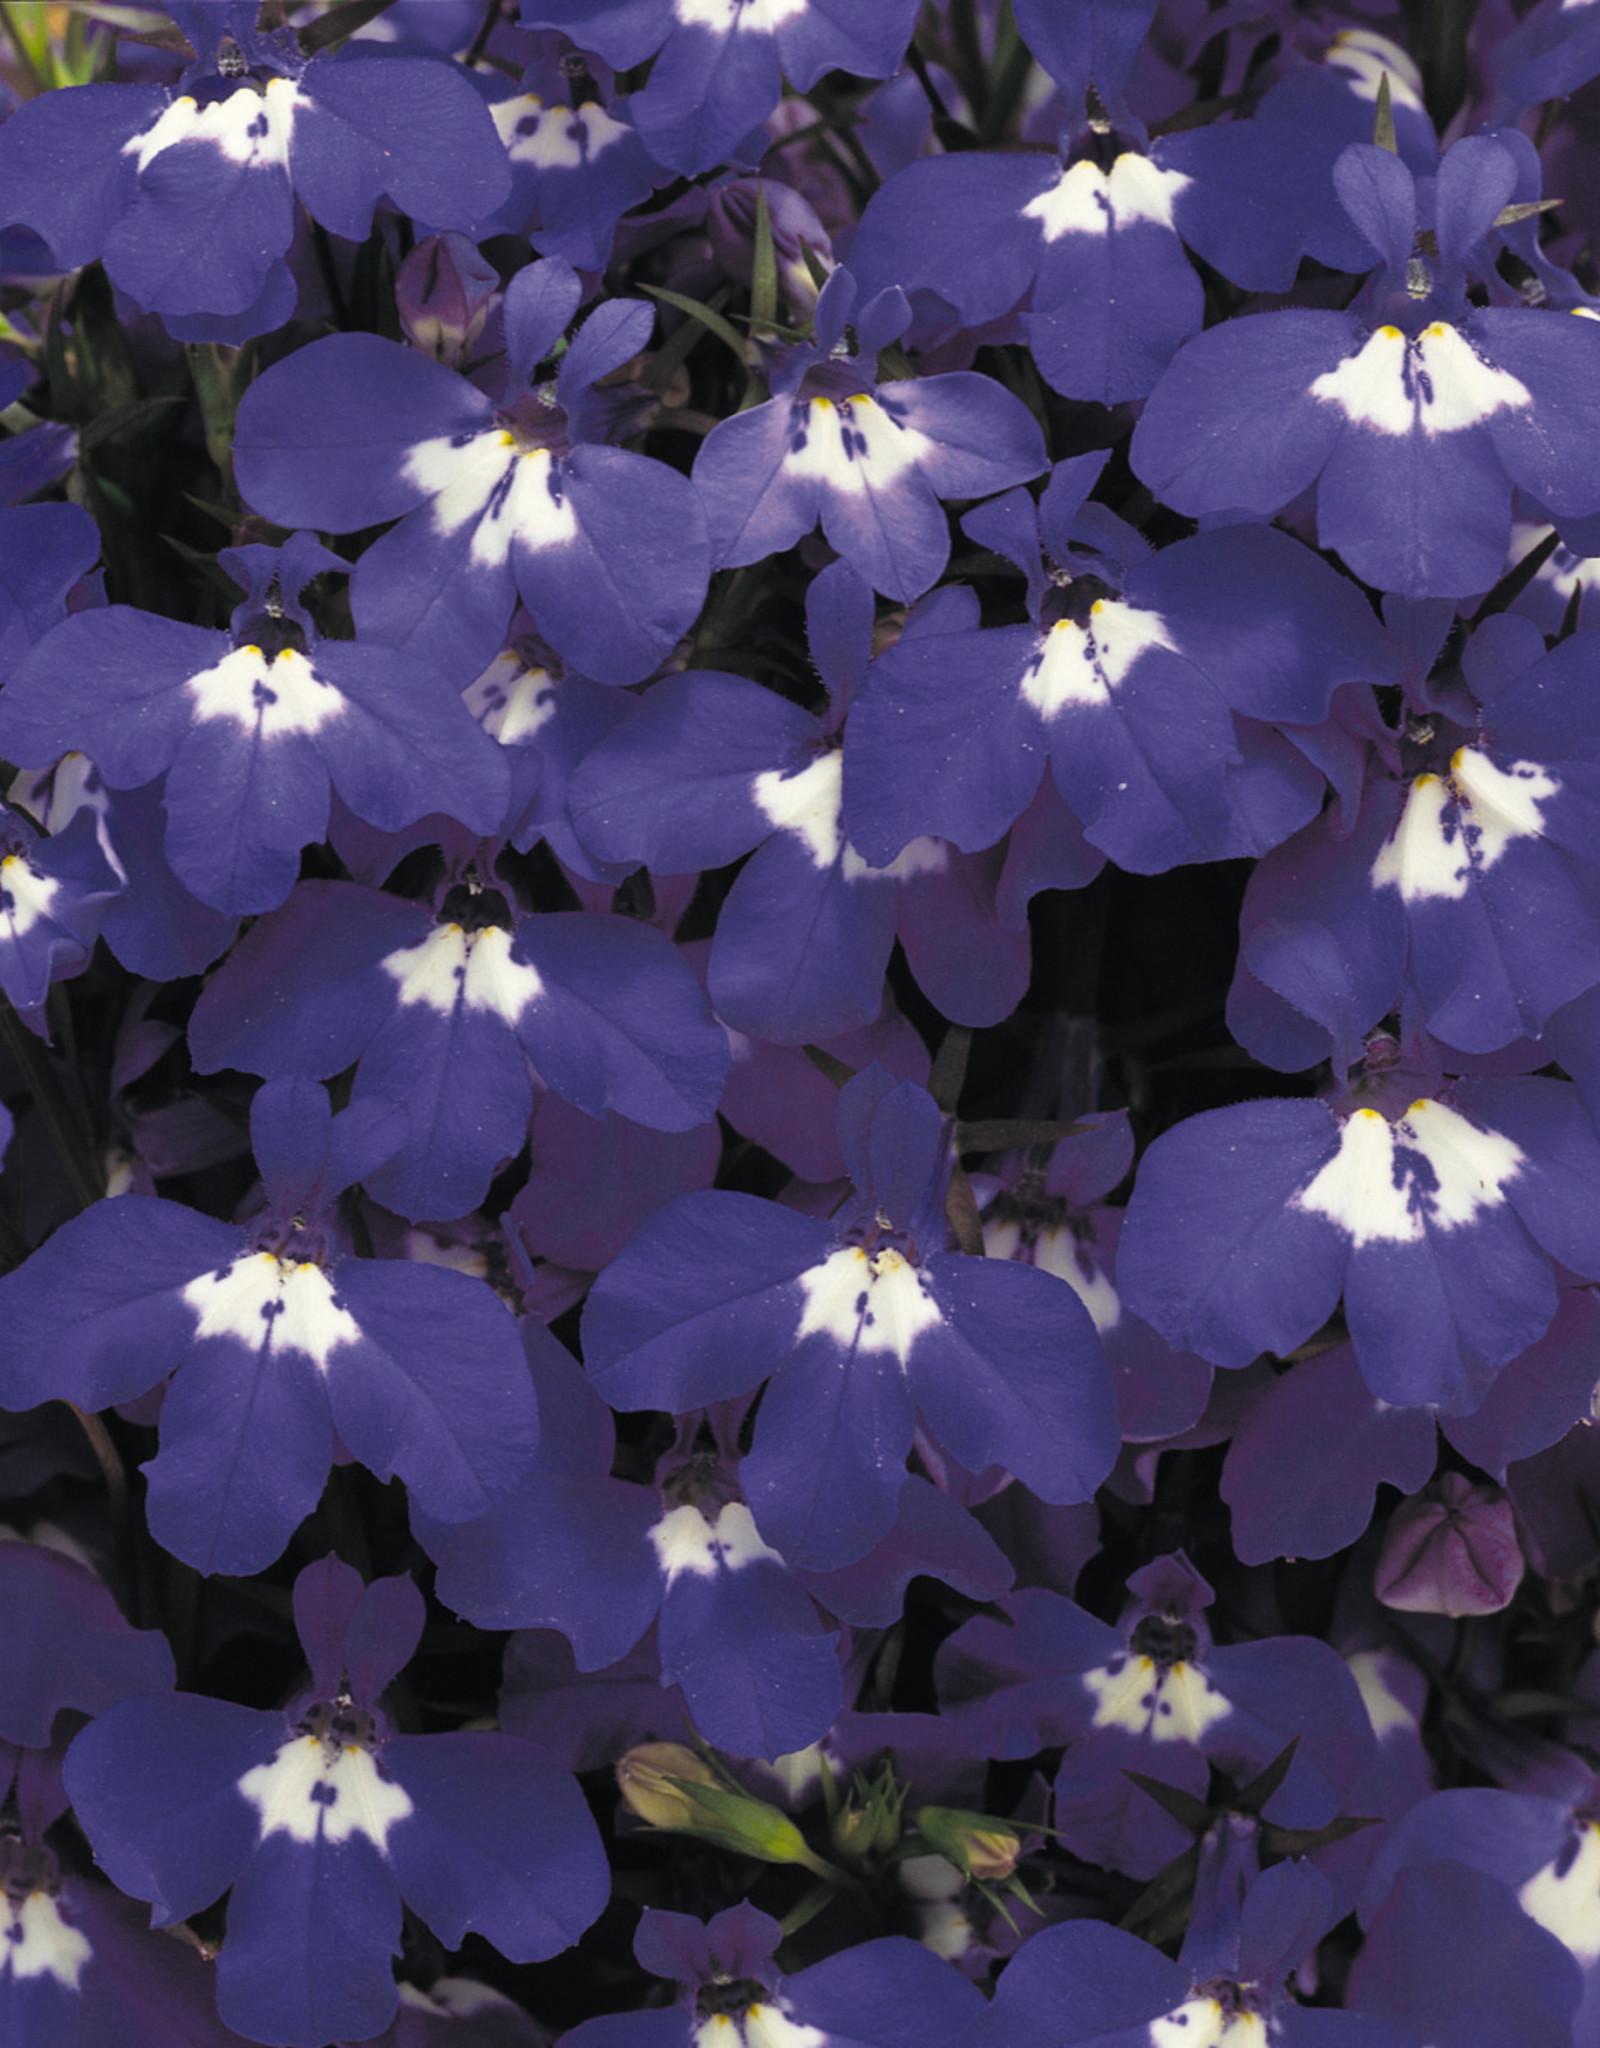 Squak Mtn Lobelia 'Riviera Blue Eyes' Jumbo Pack